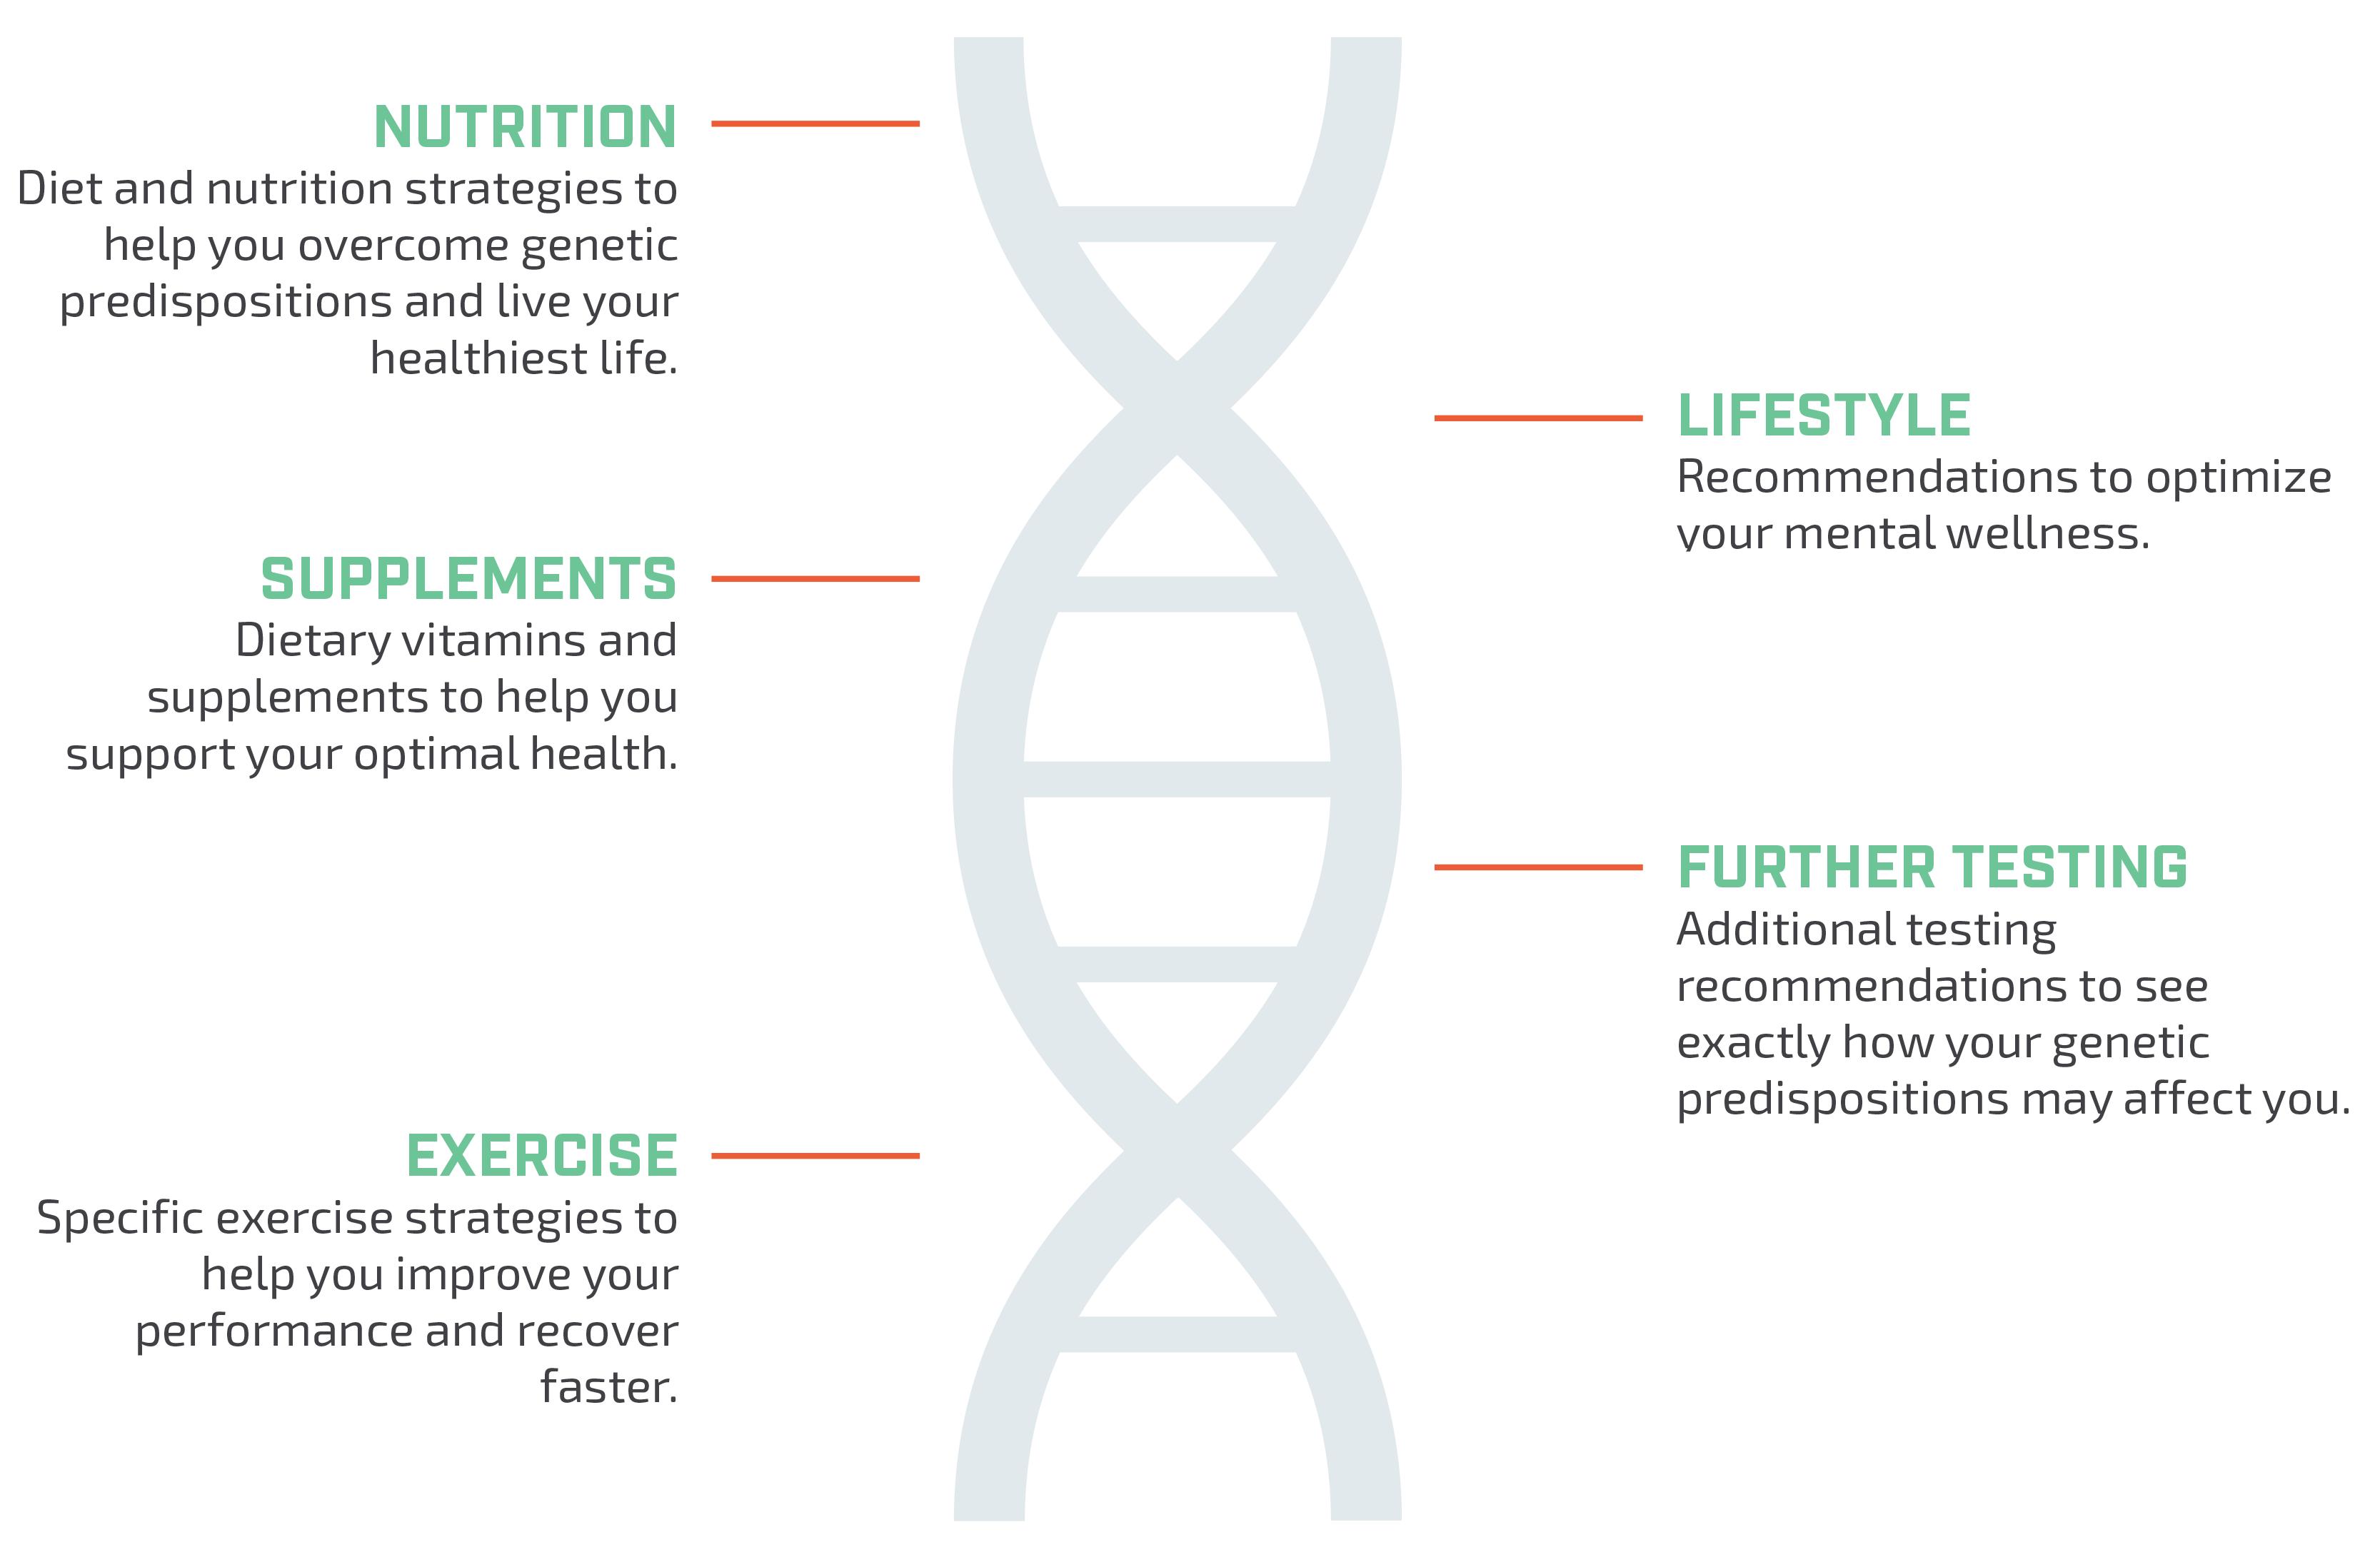 nutritiondata